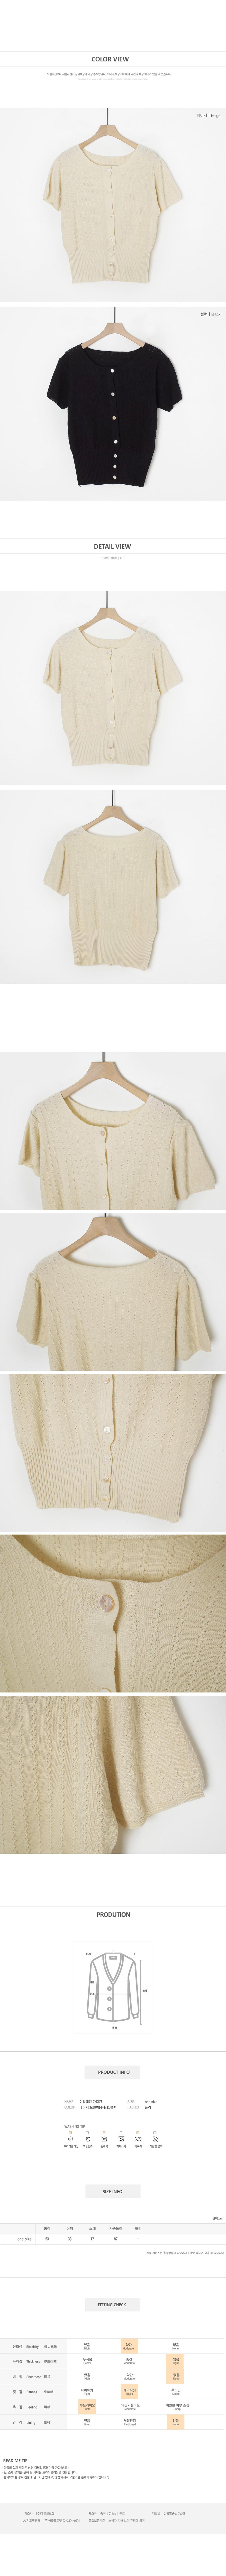 Wool pattern cardigan